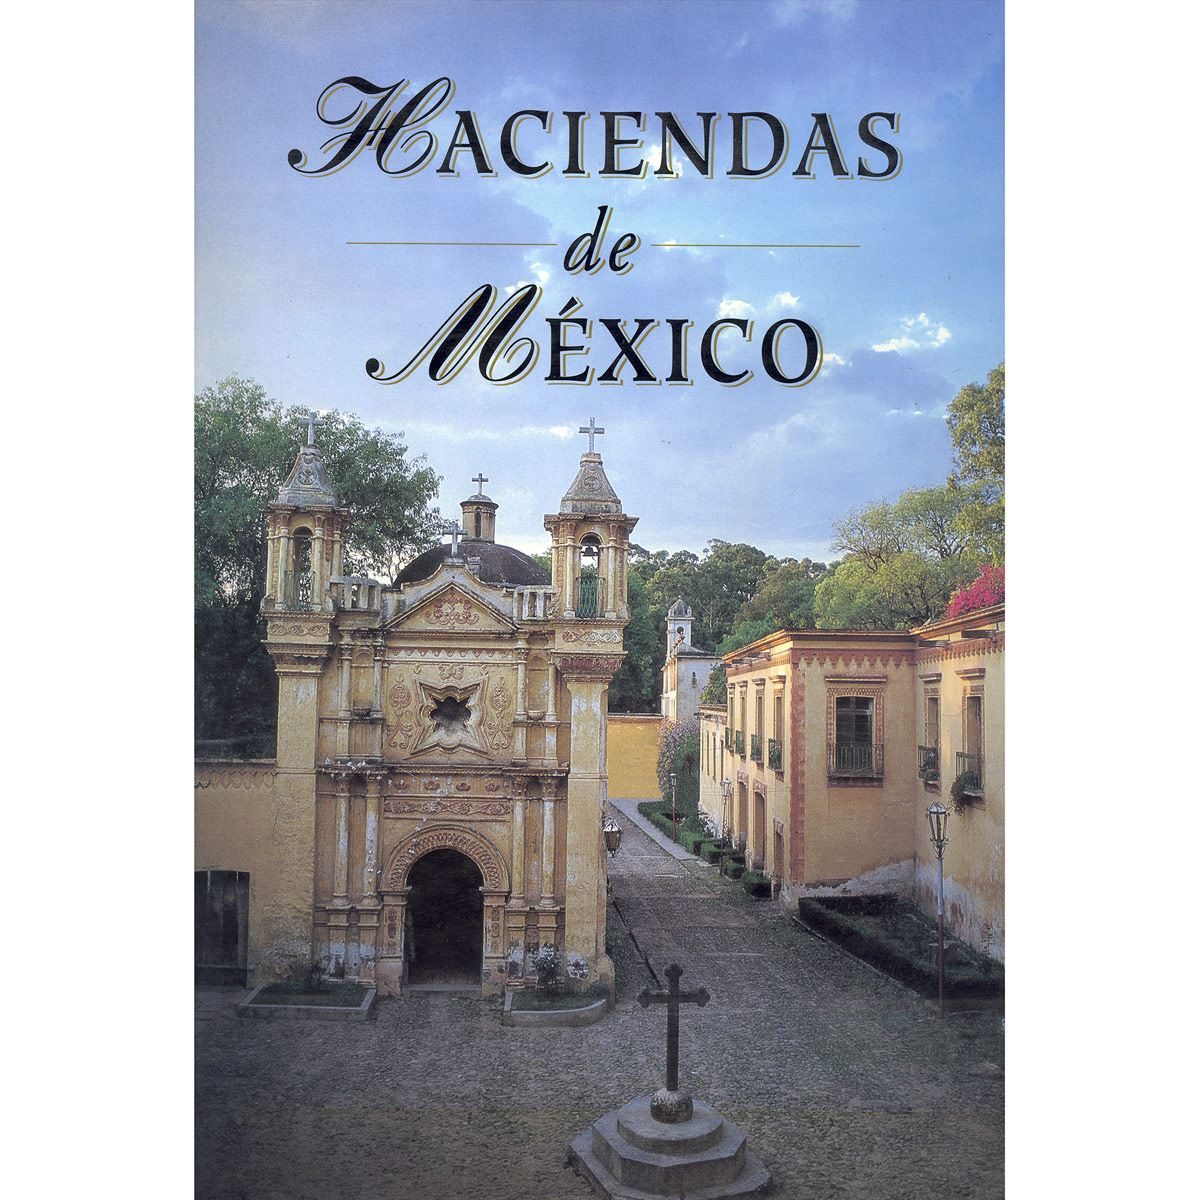 Haciendas de México - Inglés